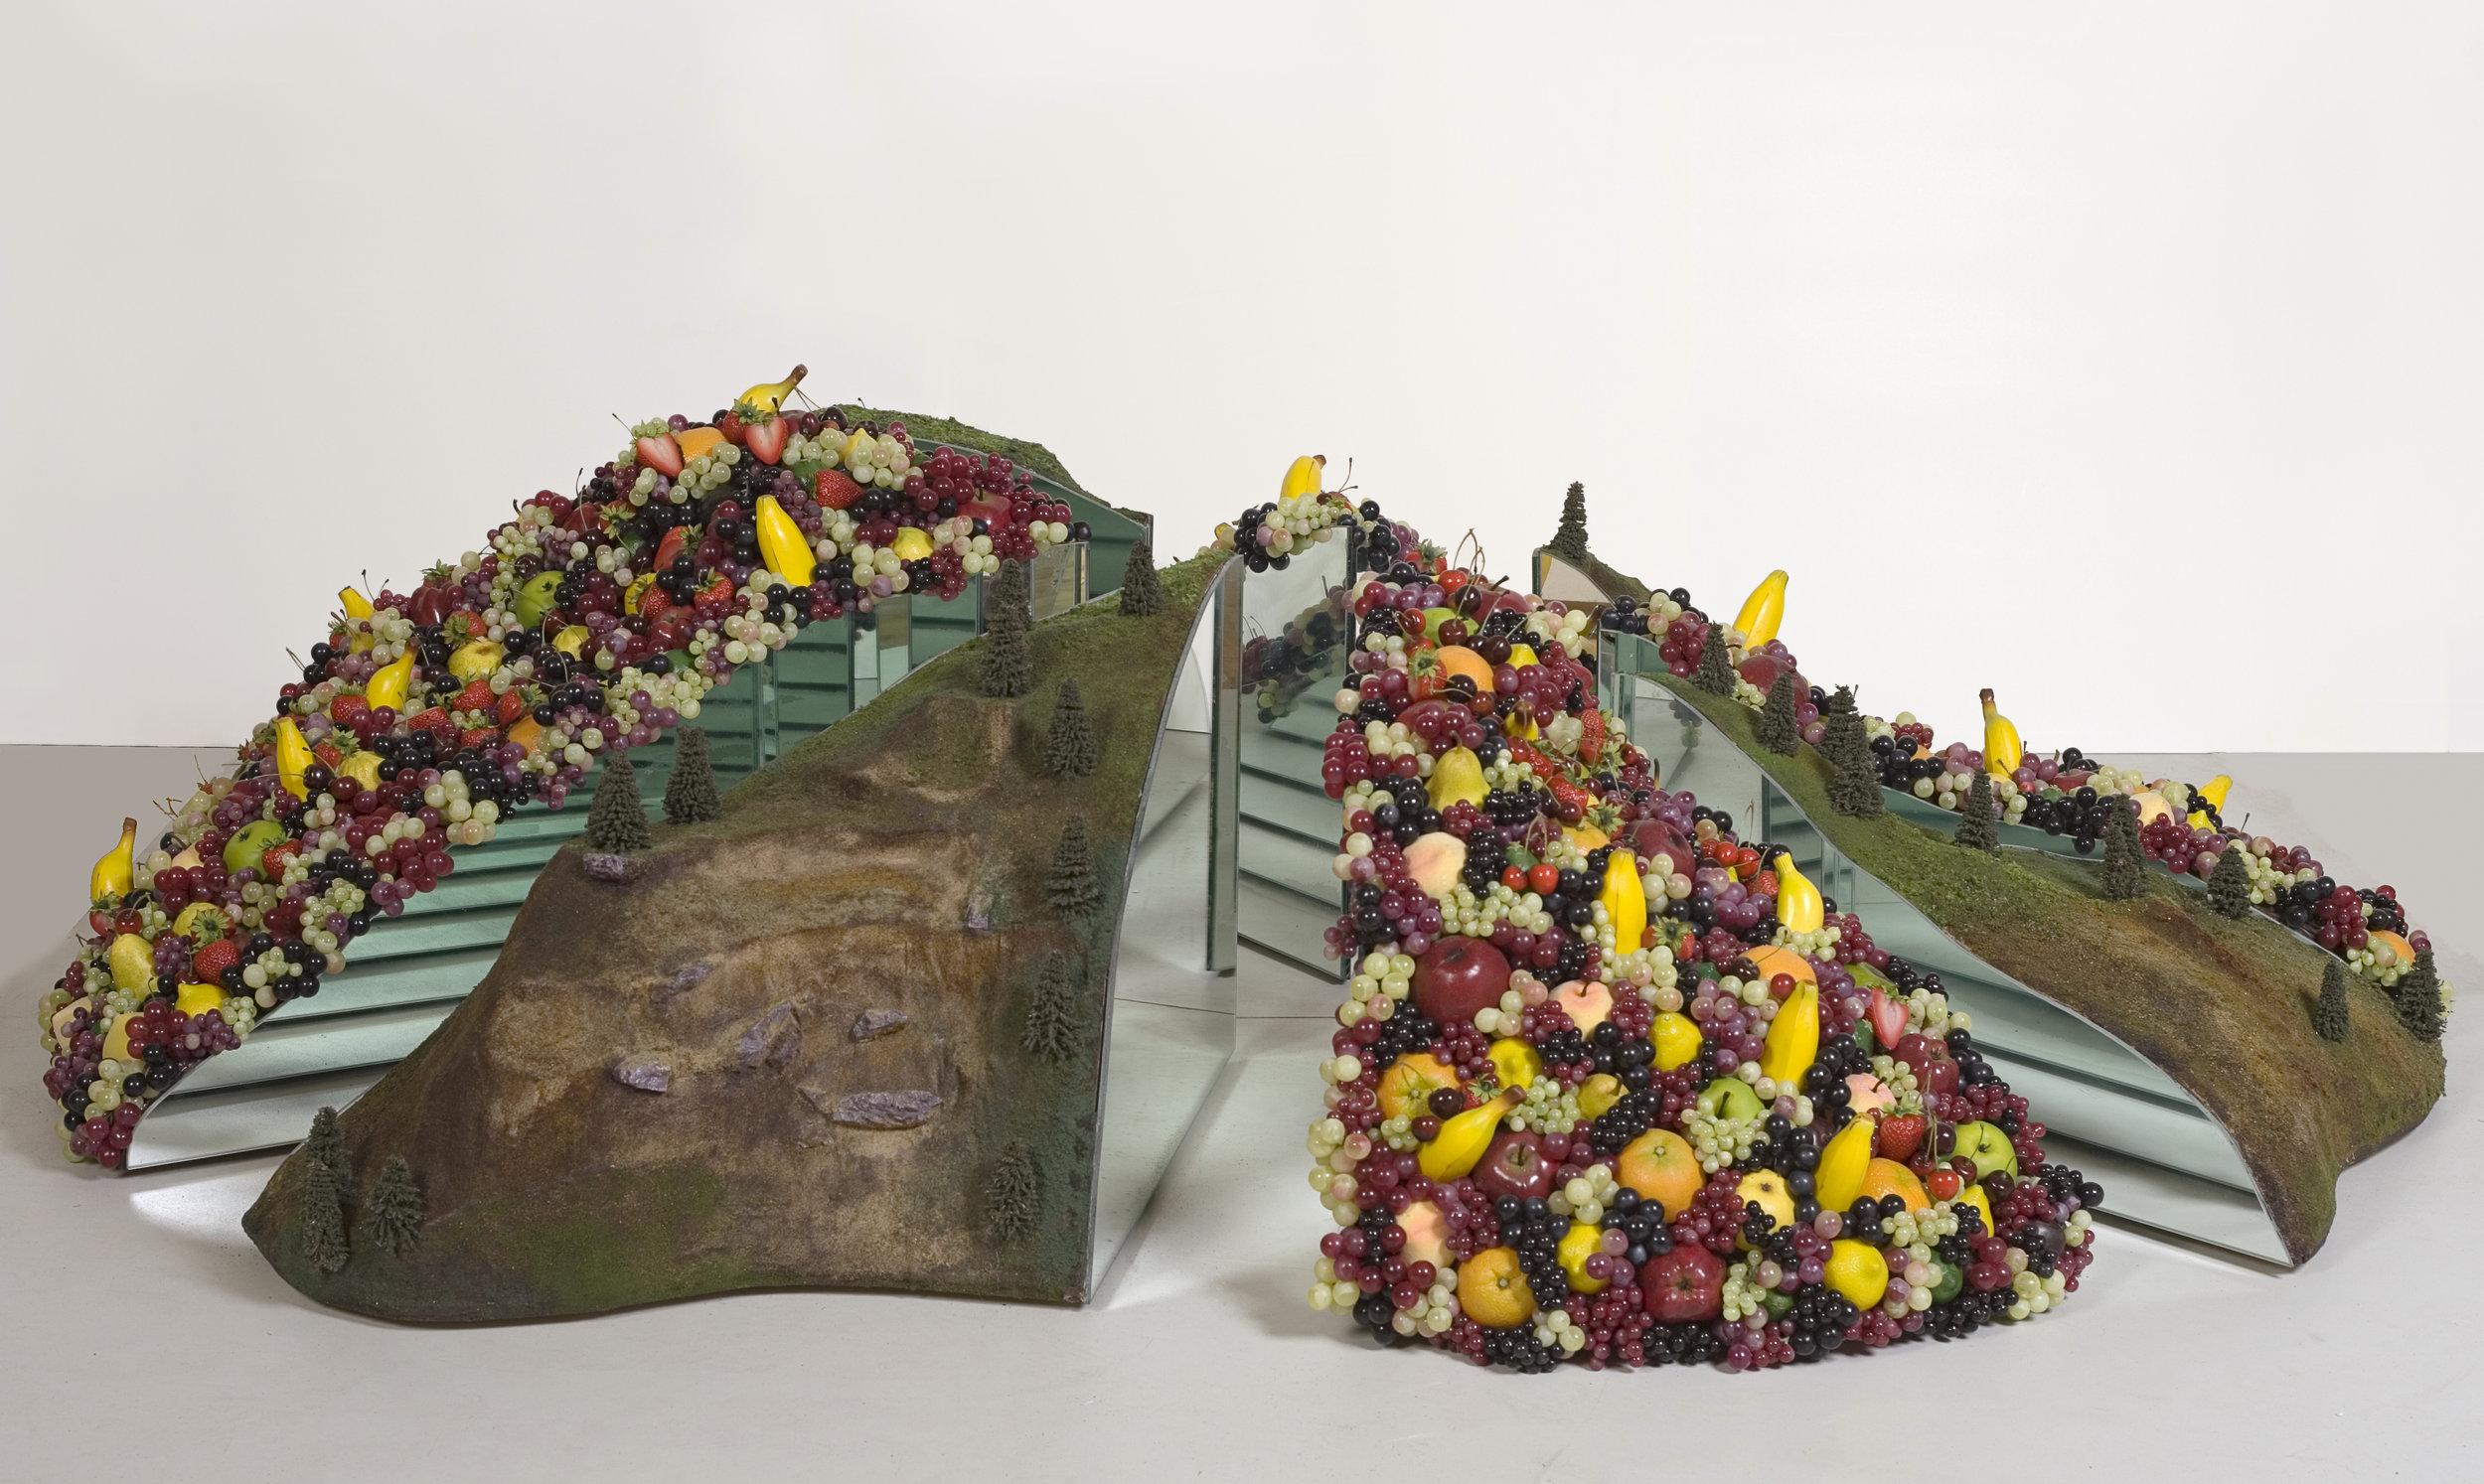 Inverted Chandelier, 2006 model railroad scenery, plastic fruits, mirror, styrofoam, wood 186 x 186 x 51 cm - 73 1/4 x 73 1/4 x 20 1/8 inches